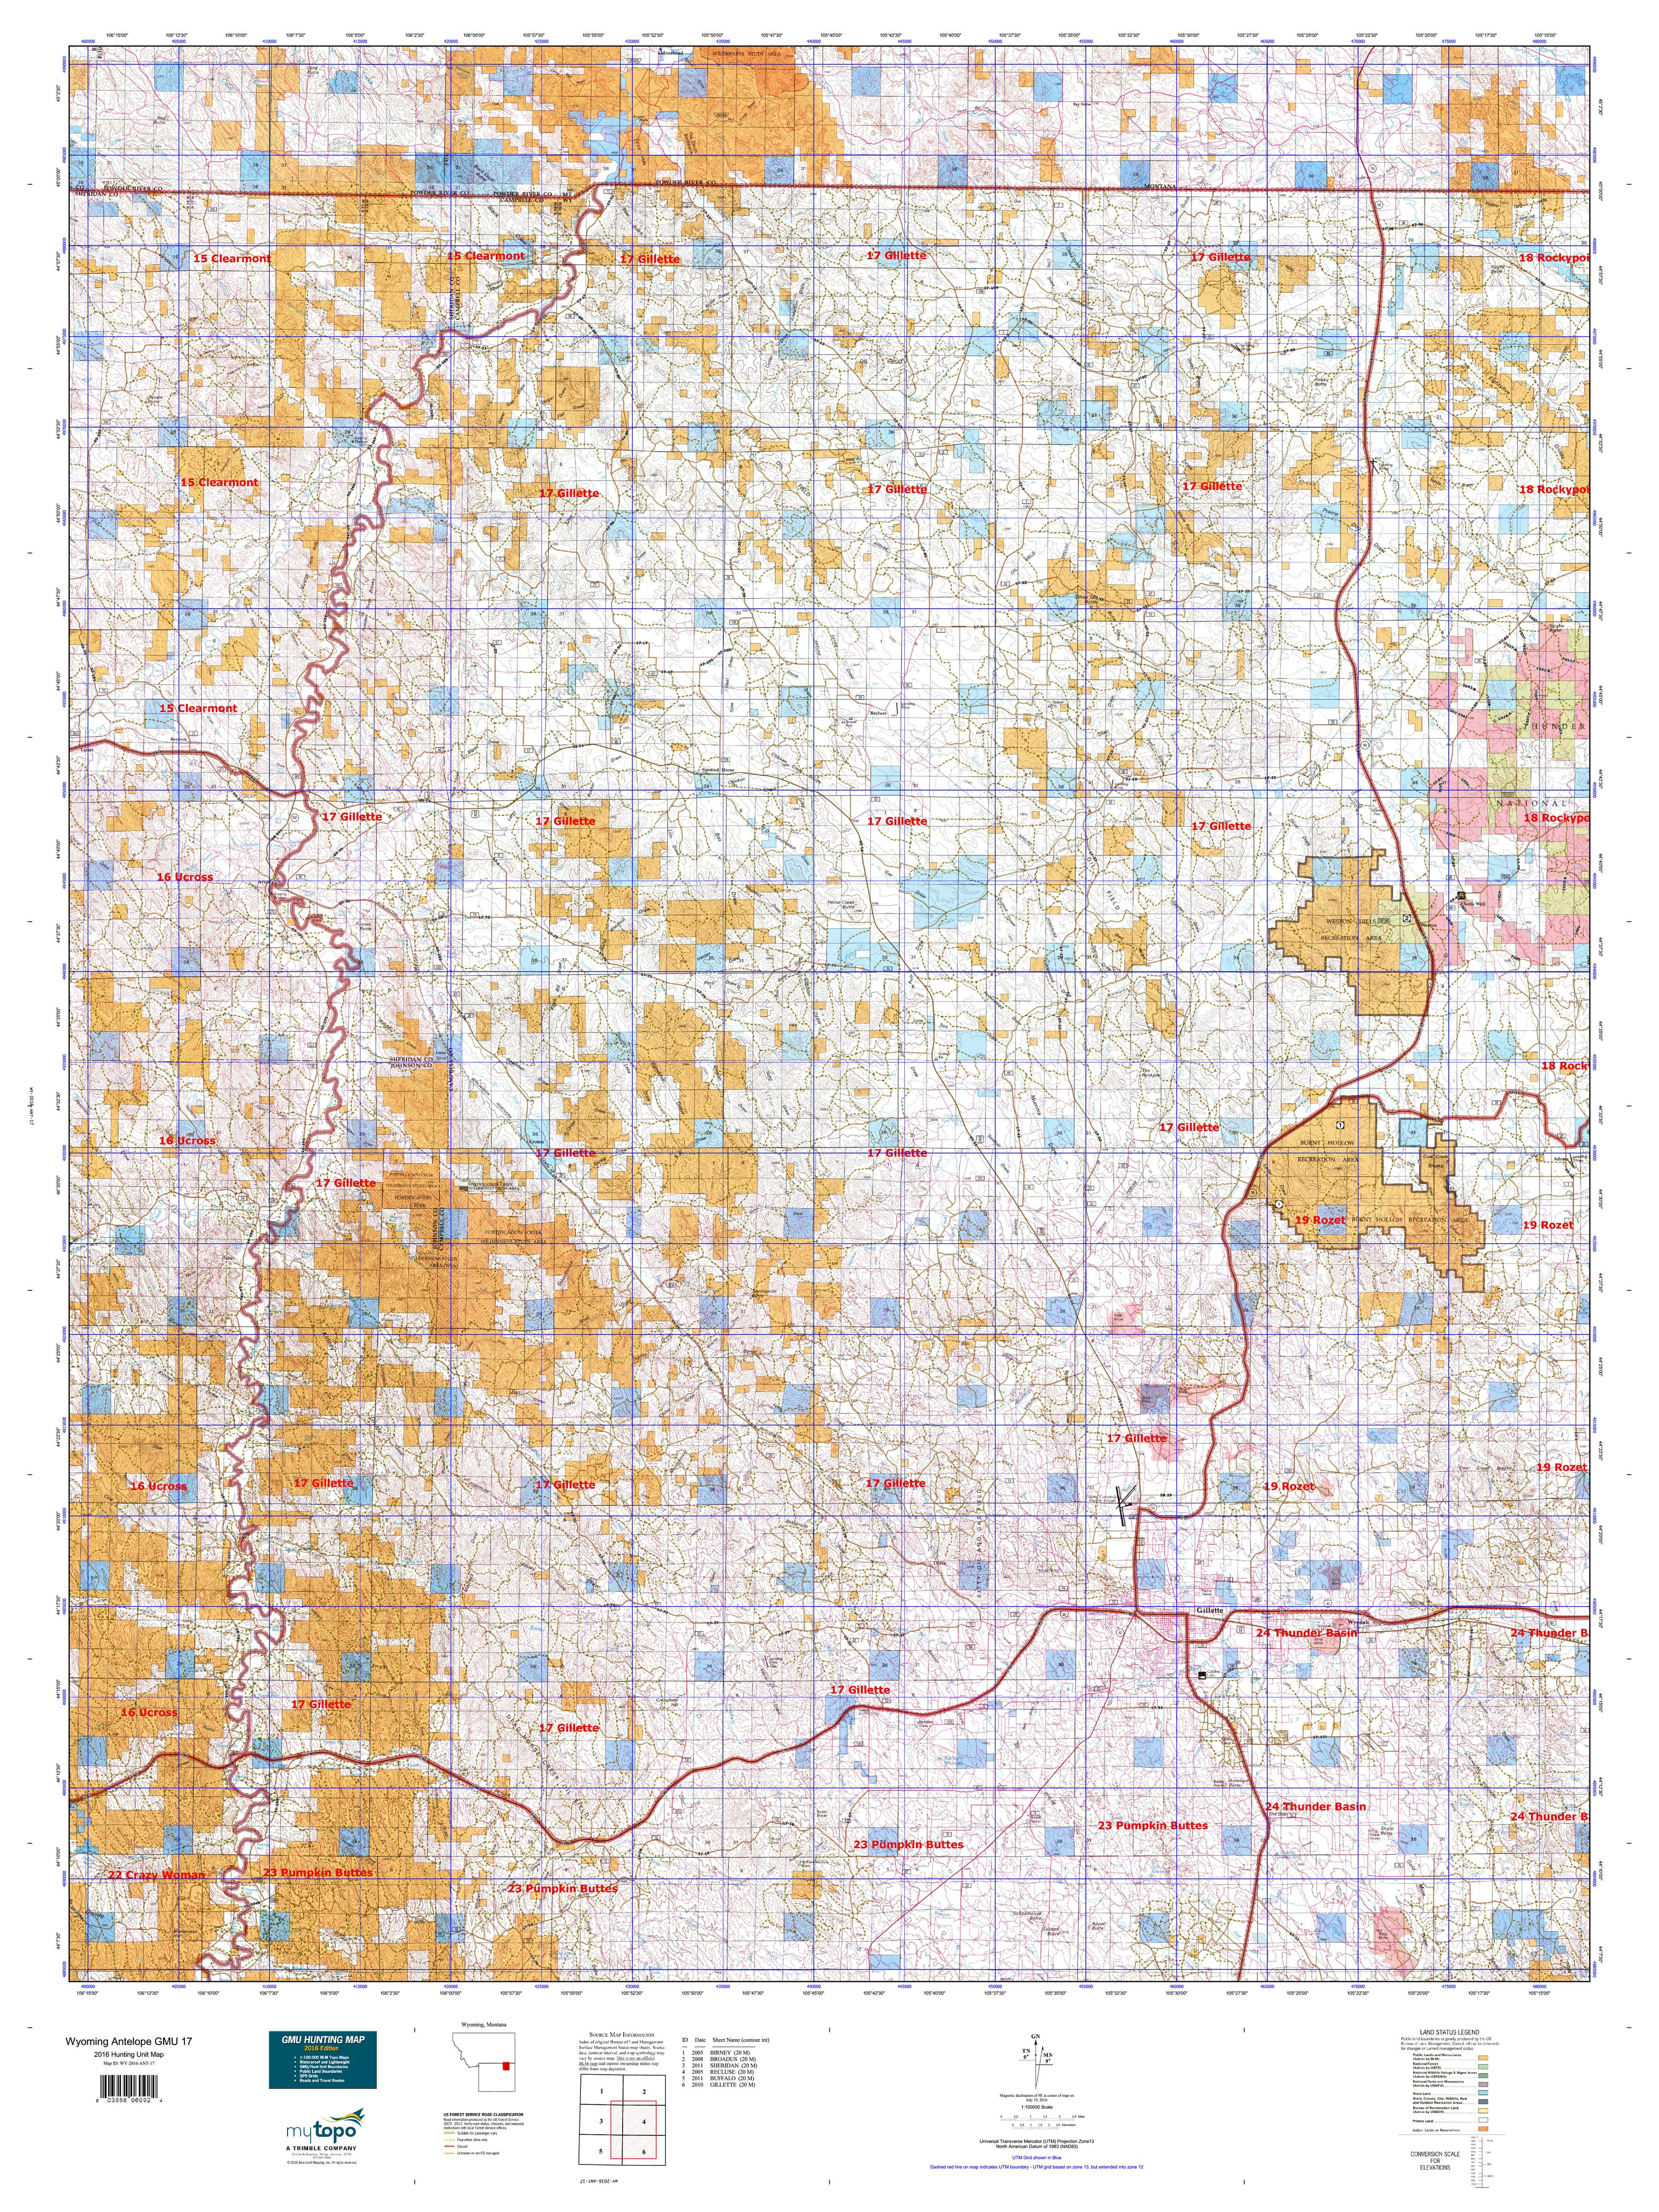 wyoming antelope unit map – bnhspine.com on wyoming landowner maps, wyoming mule deer unit map, round valley state park hunting zone map, kansas public hunting area map, wyoming coal mine jobs, nevada hunt unit map, wyoming blm gis data, wy antelope hunting area map, wyoming game and fish units, 94 wyoming unit map,